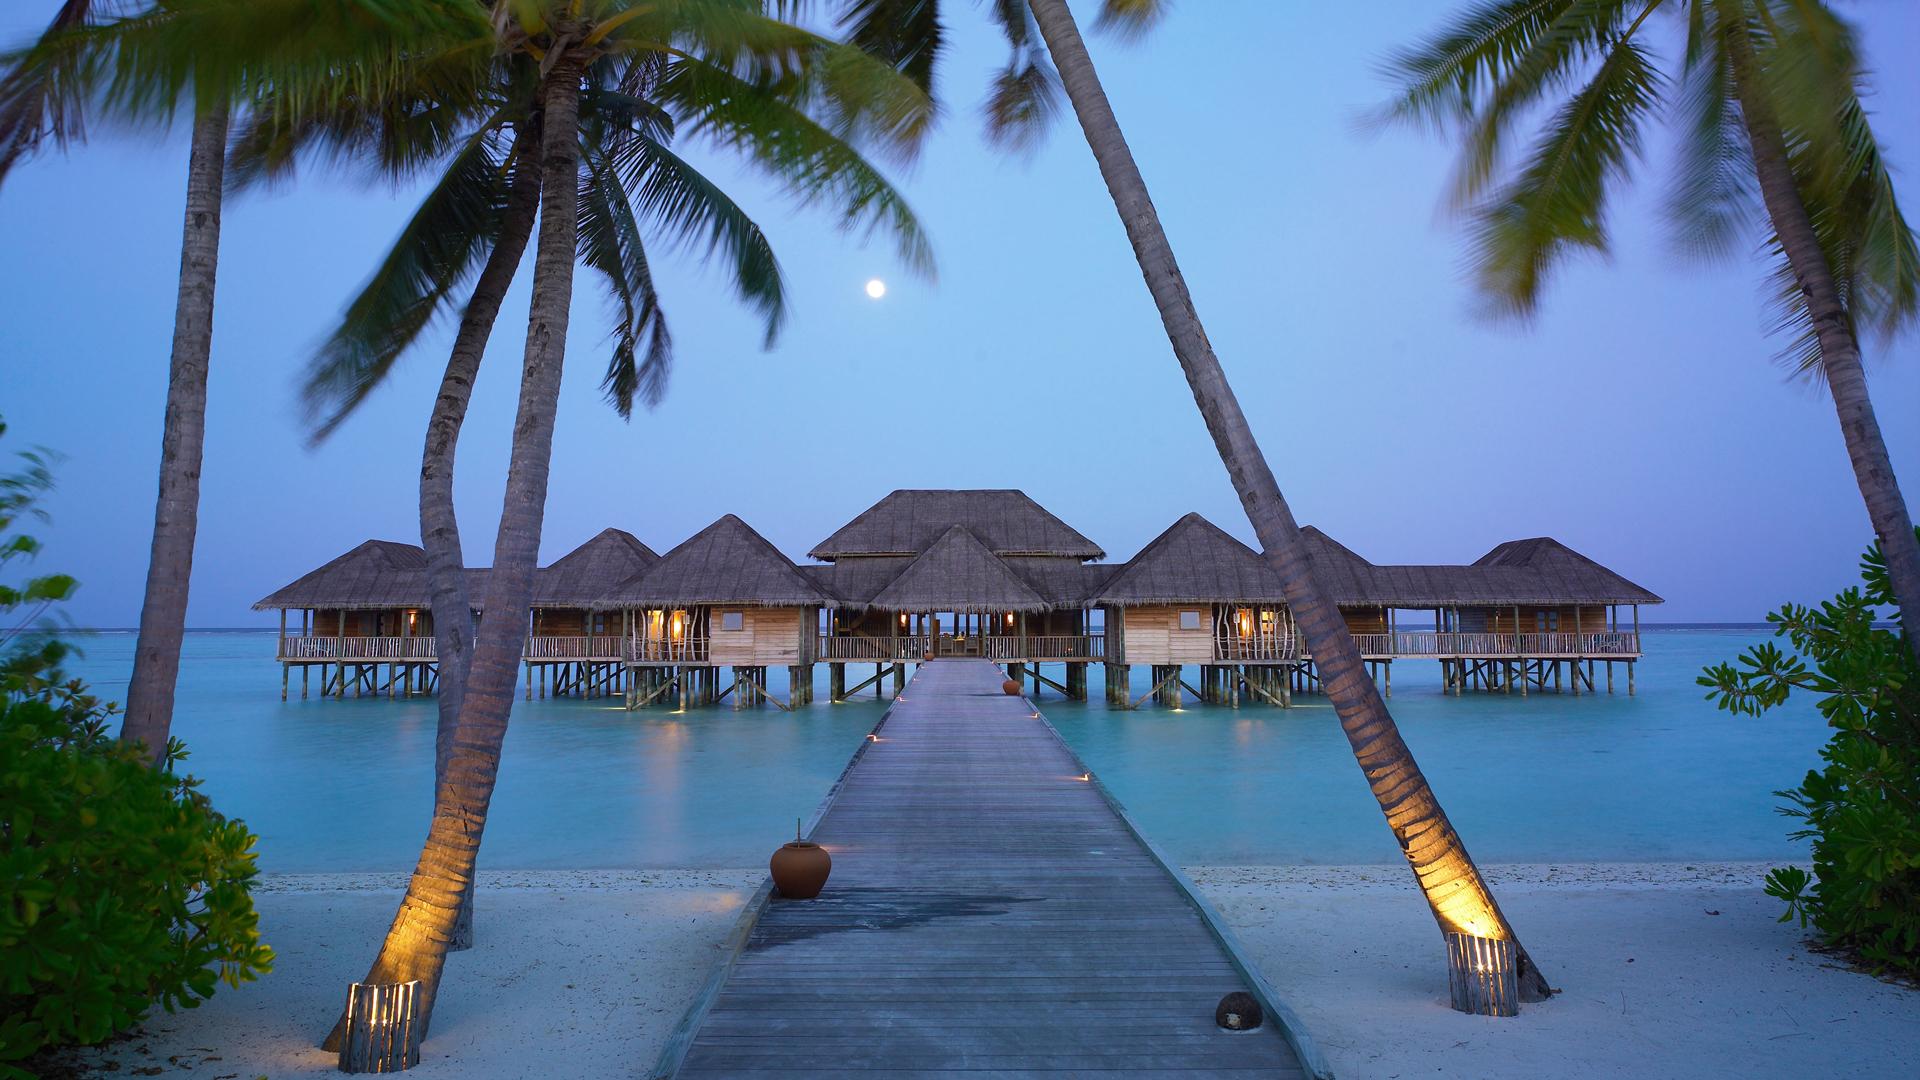 h_8_maldiv_2.jpg